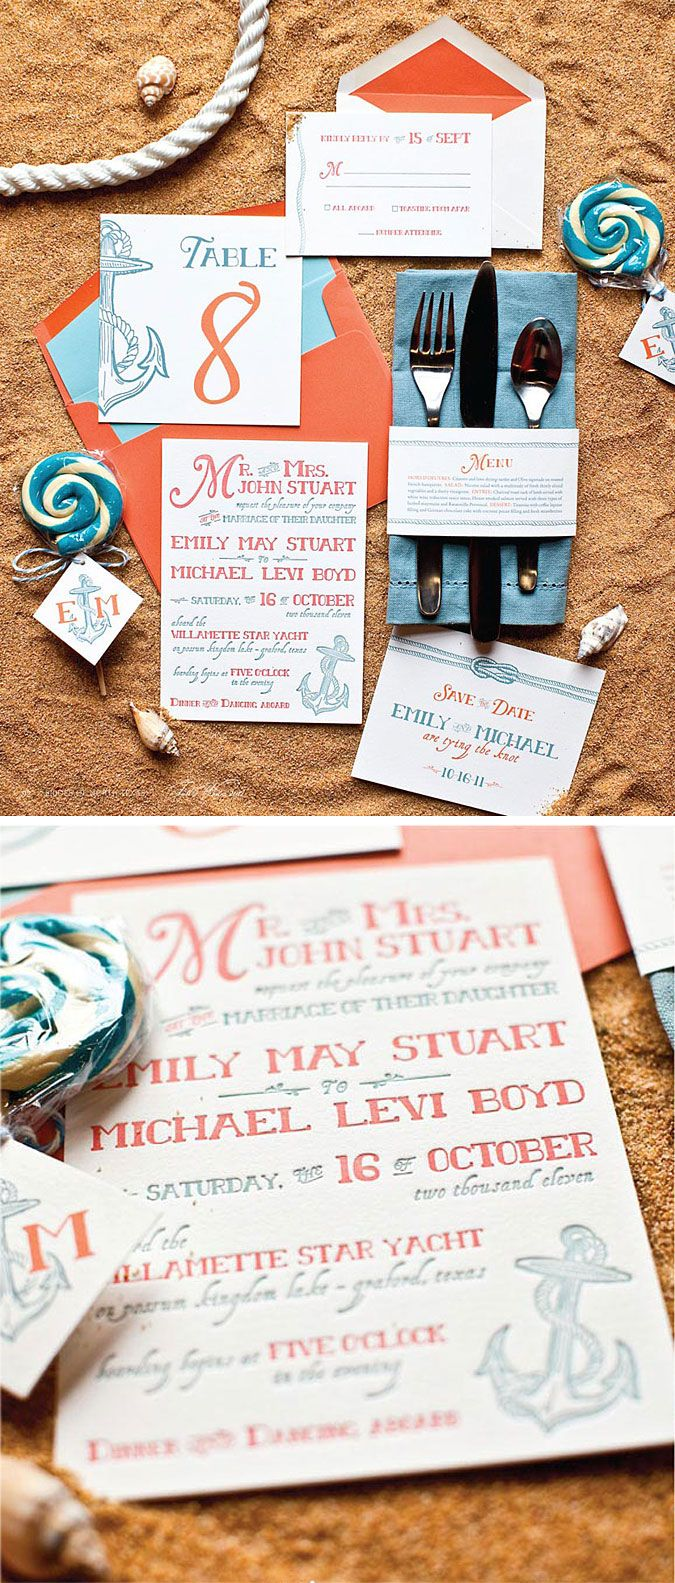 Nautical letterpress wedding invitation wedding ideas pinterest